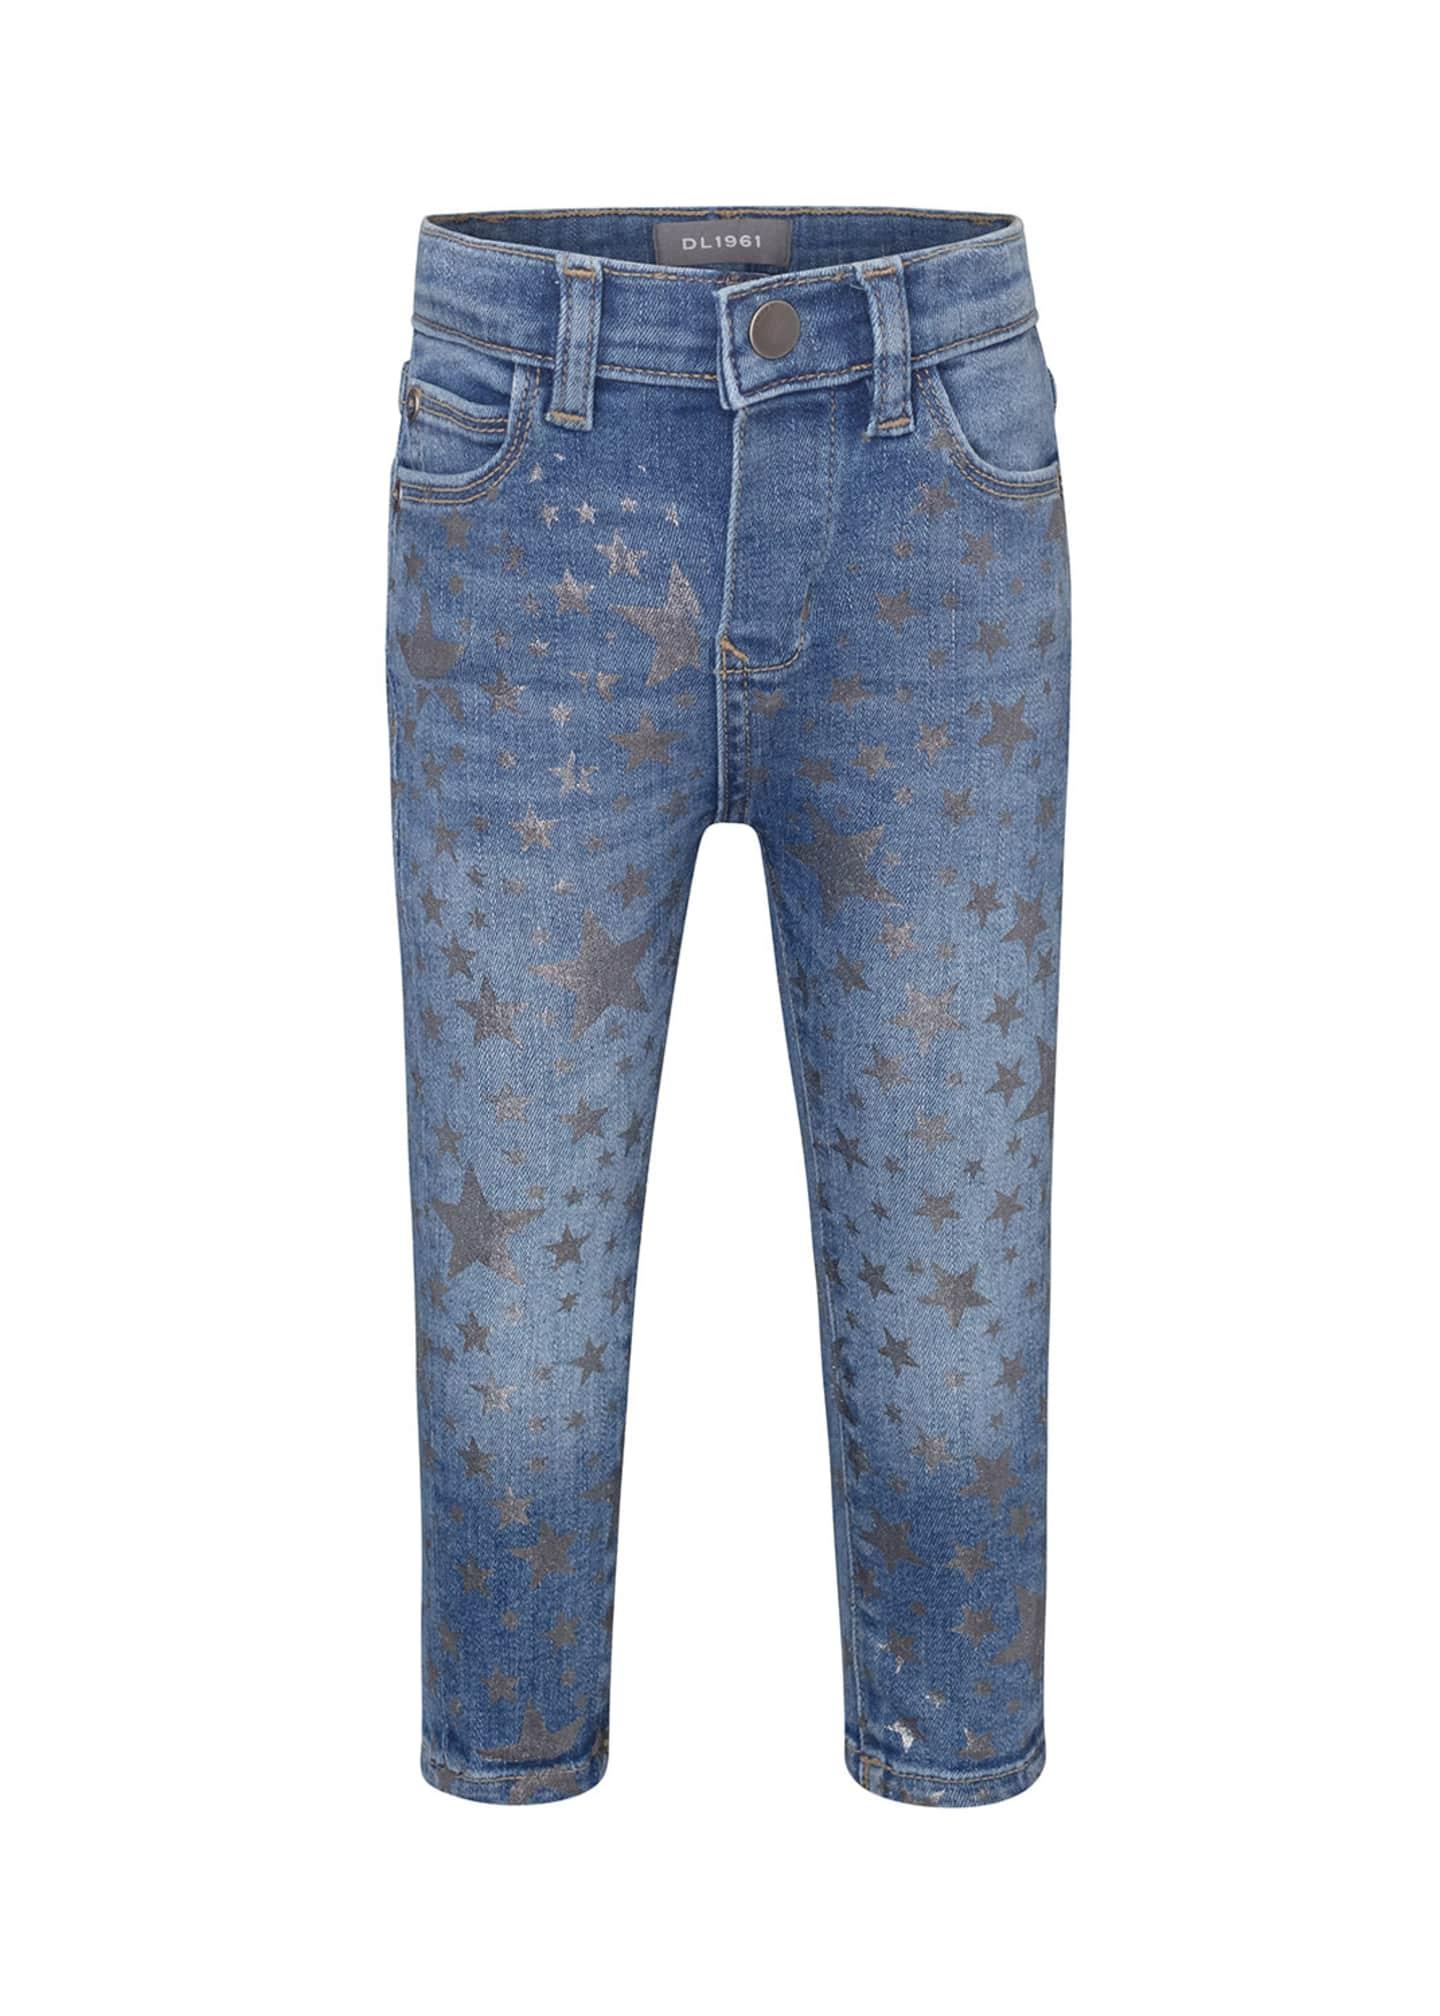 DL 1961 Sophie Metallic Star Print Skinny Jeans,